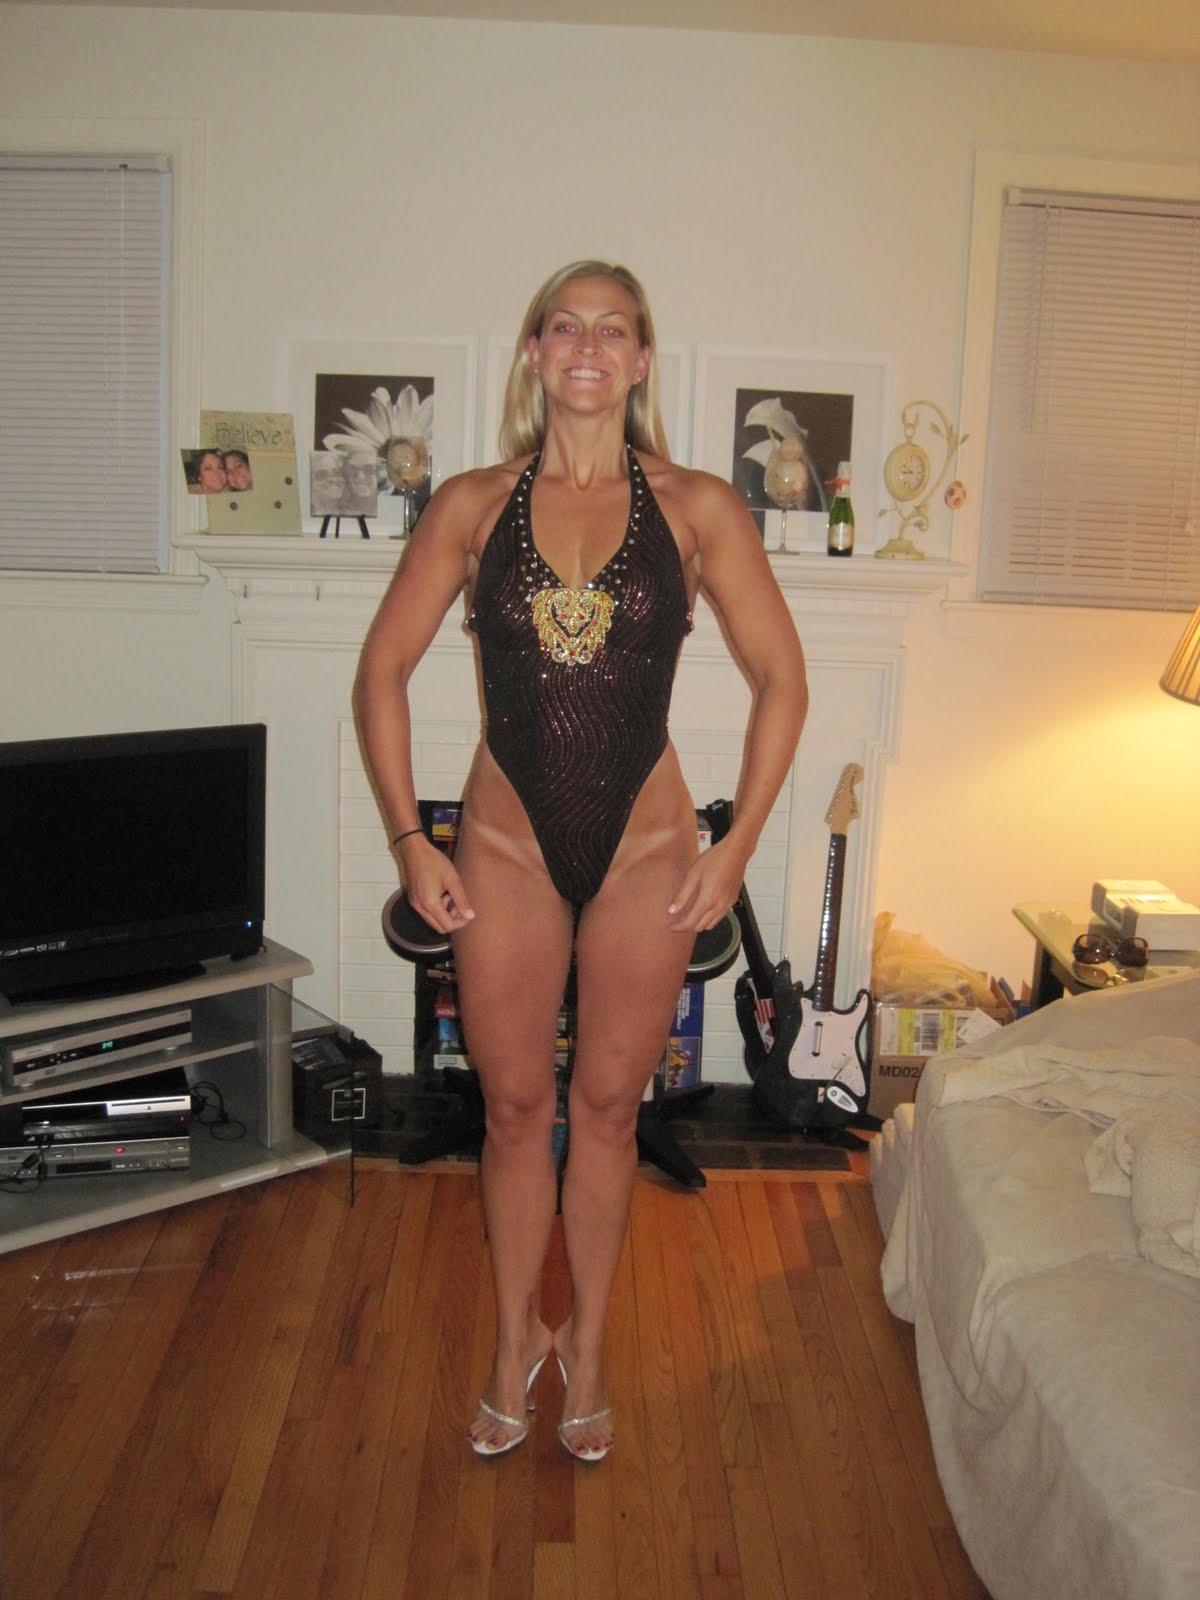 Fake nude olson twins pics